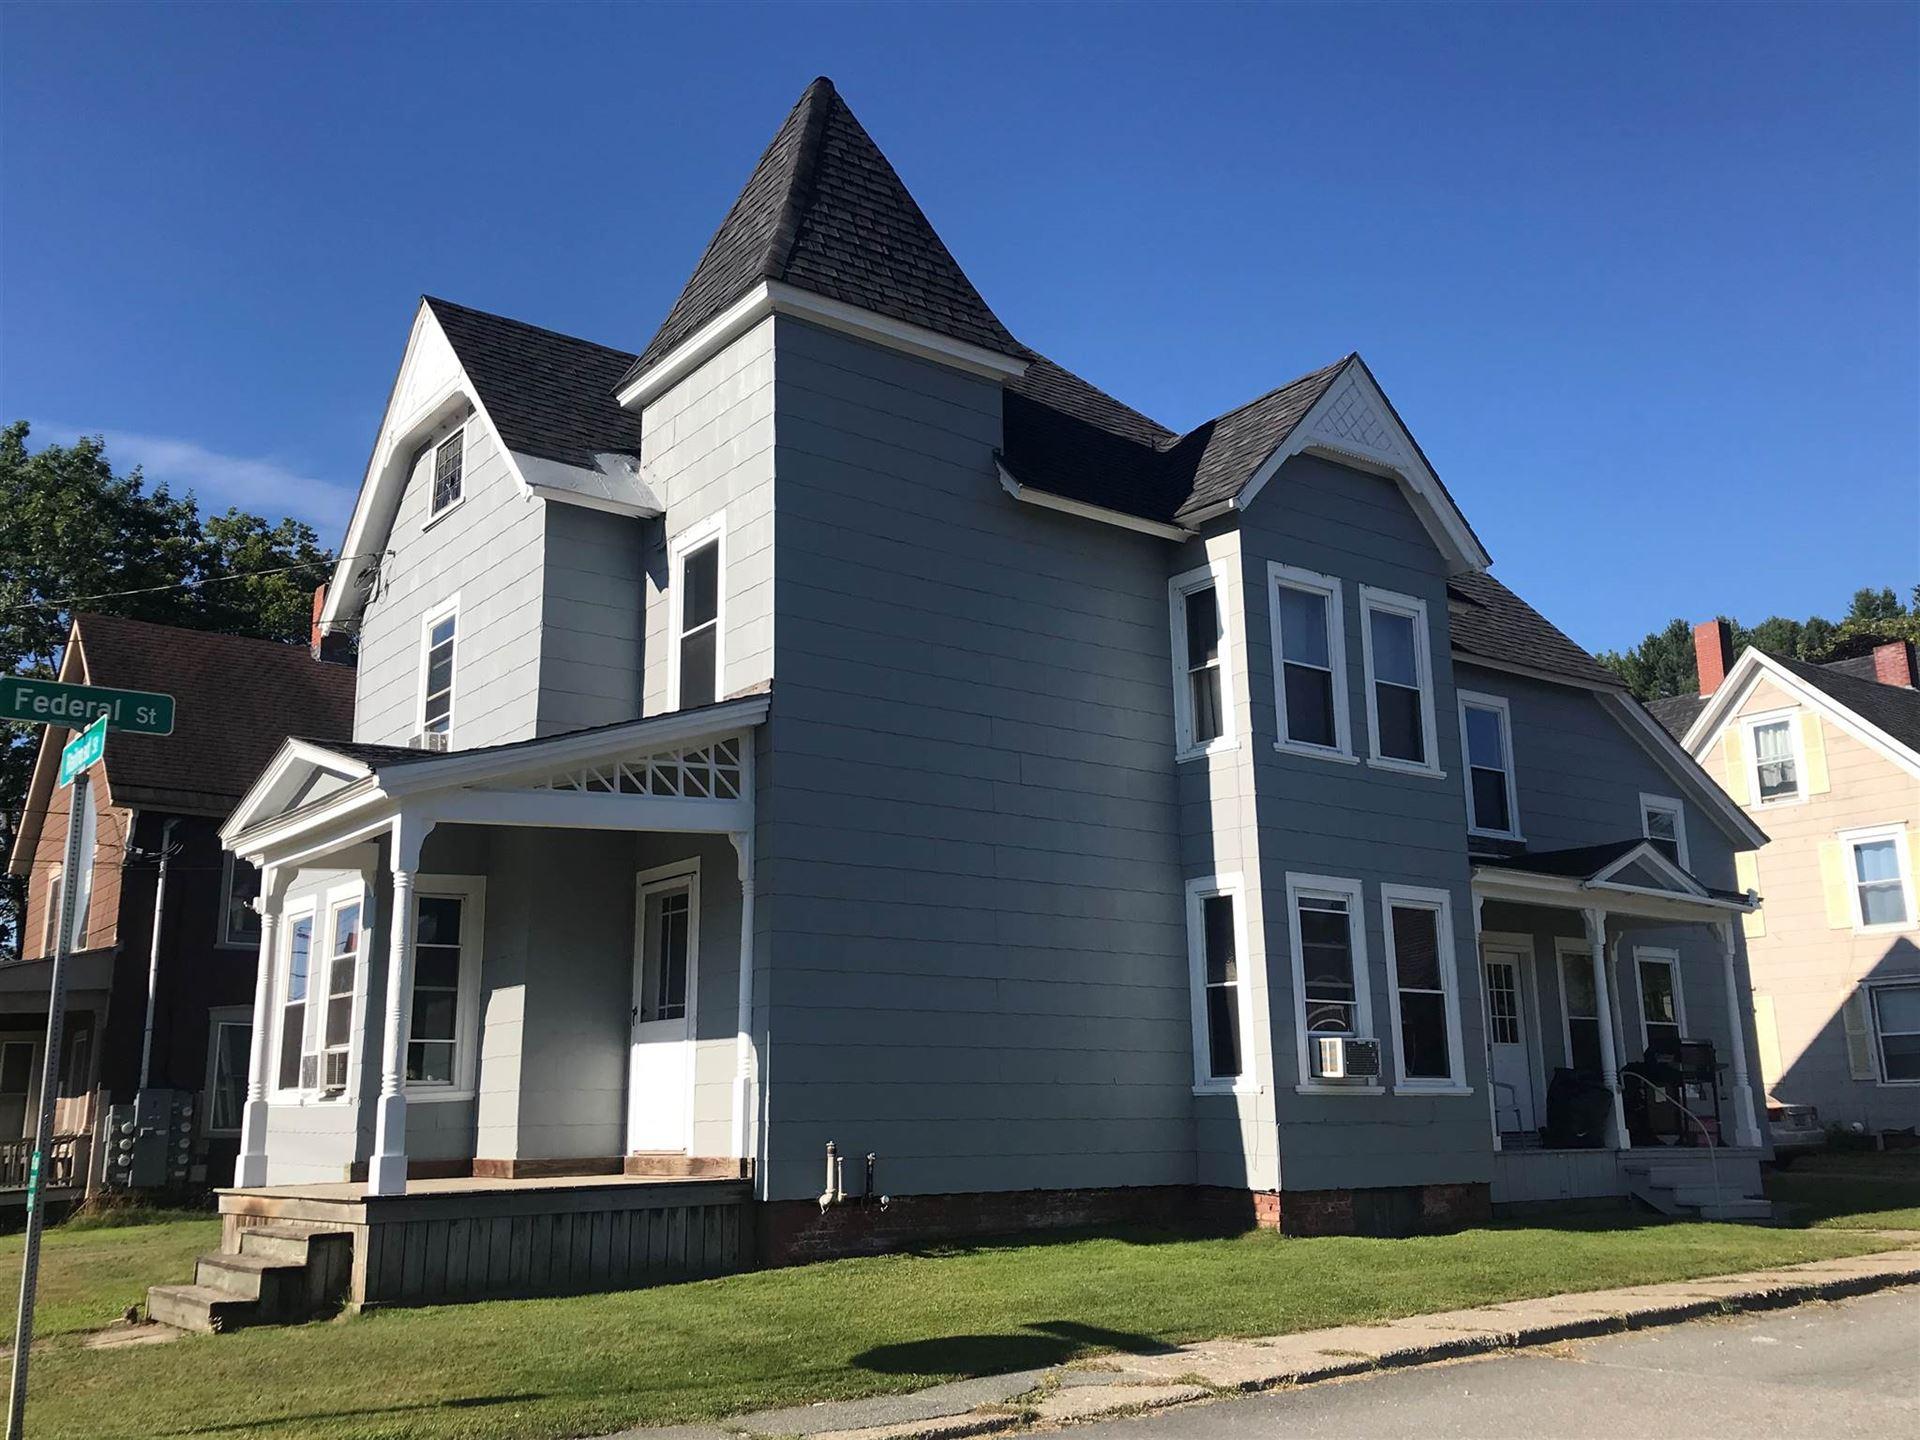 17 Federal Street, Saint Johnsbury, VT 05819 - MLS#: 4812832